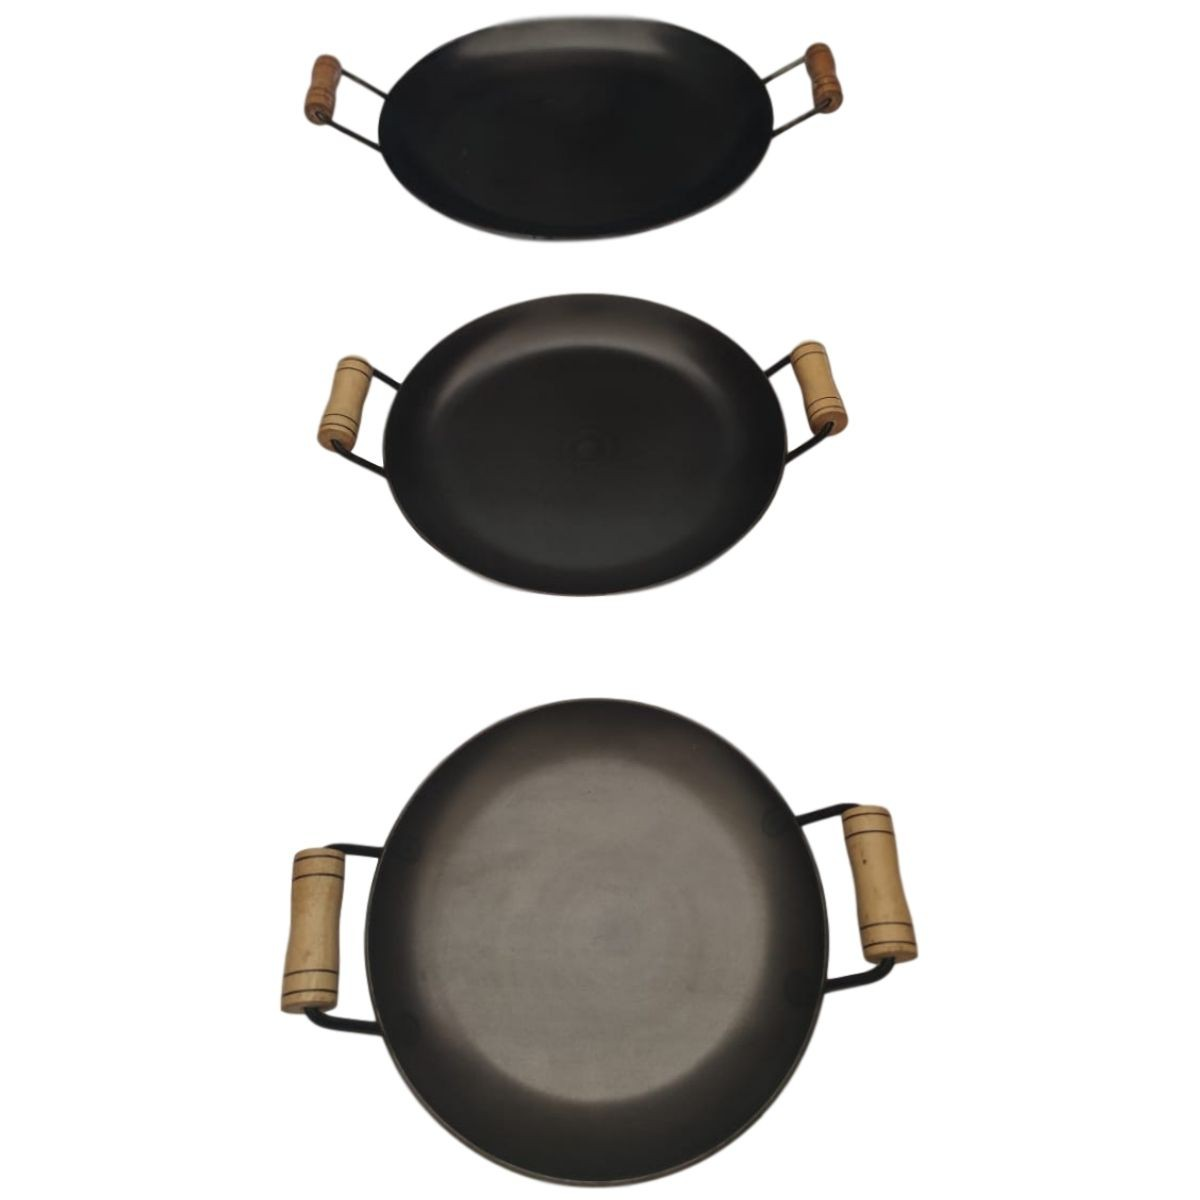 kit de disco chapa bifeteira Redonda De Ferro Fundido - P, M, G